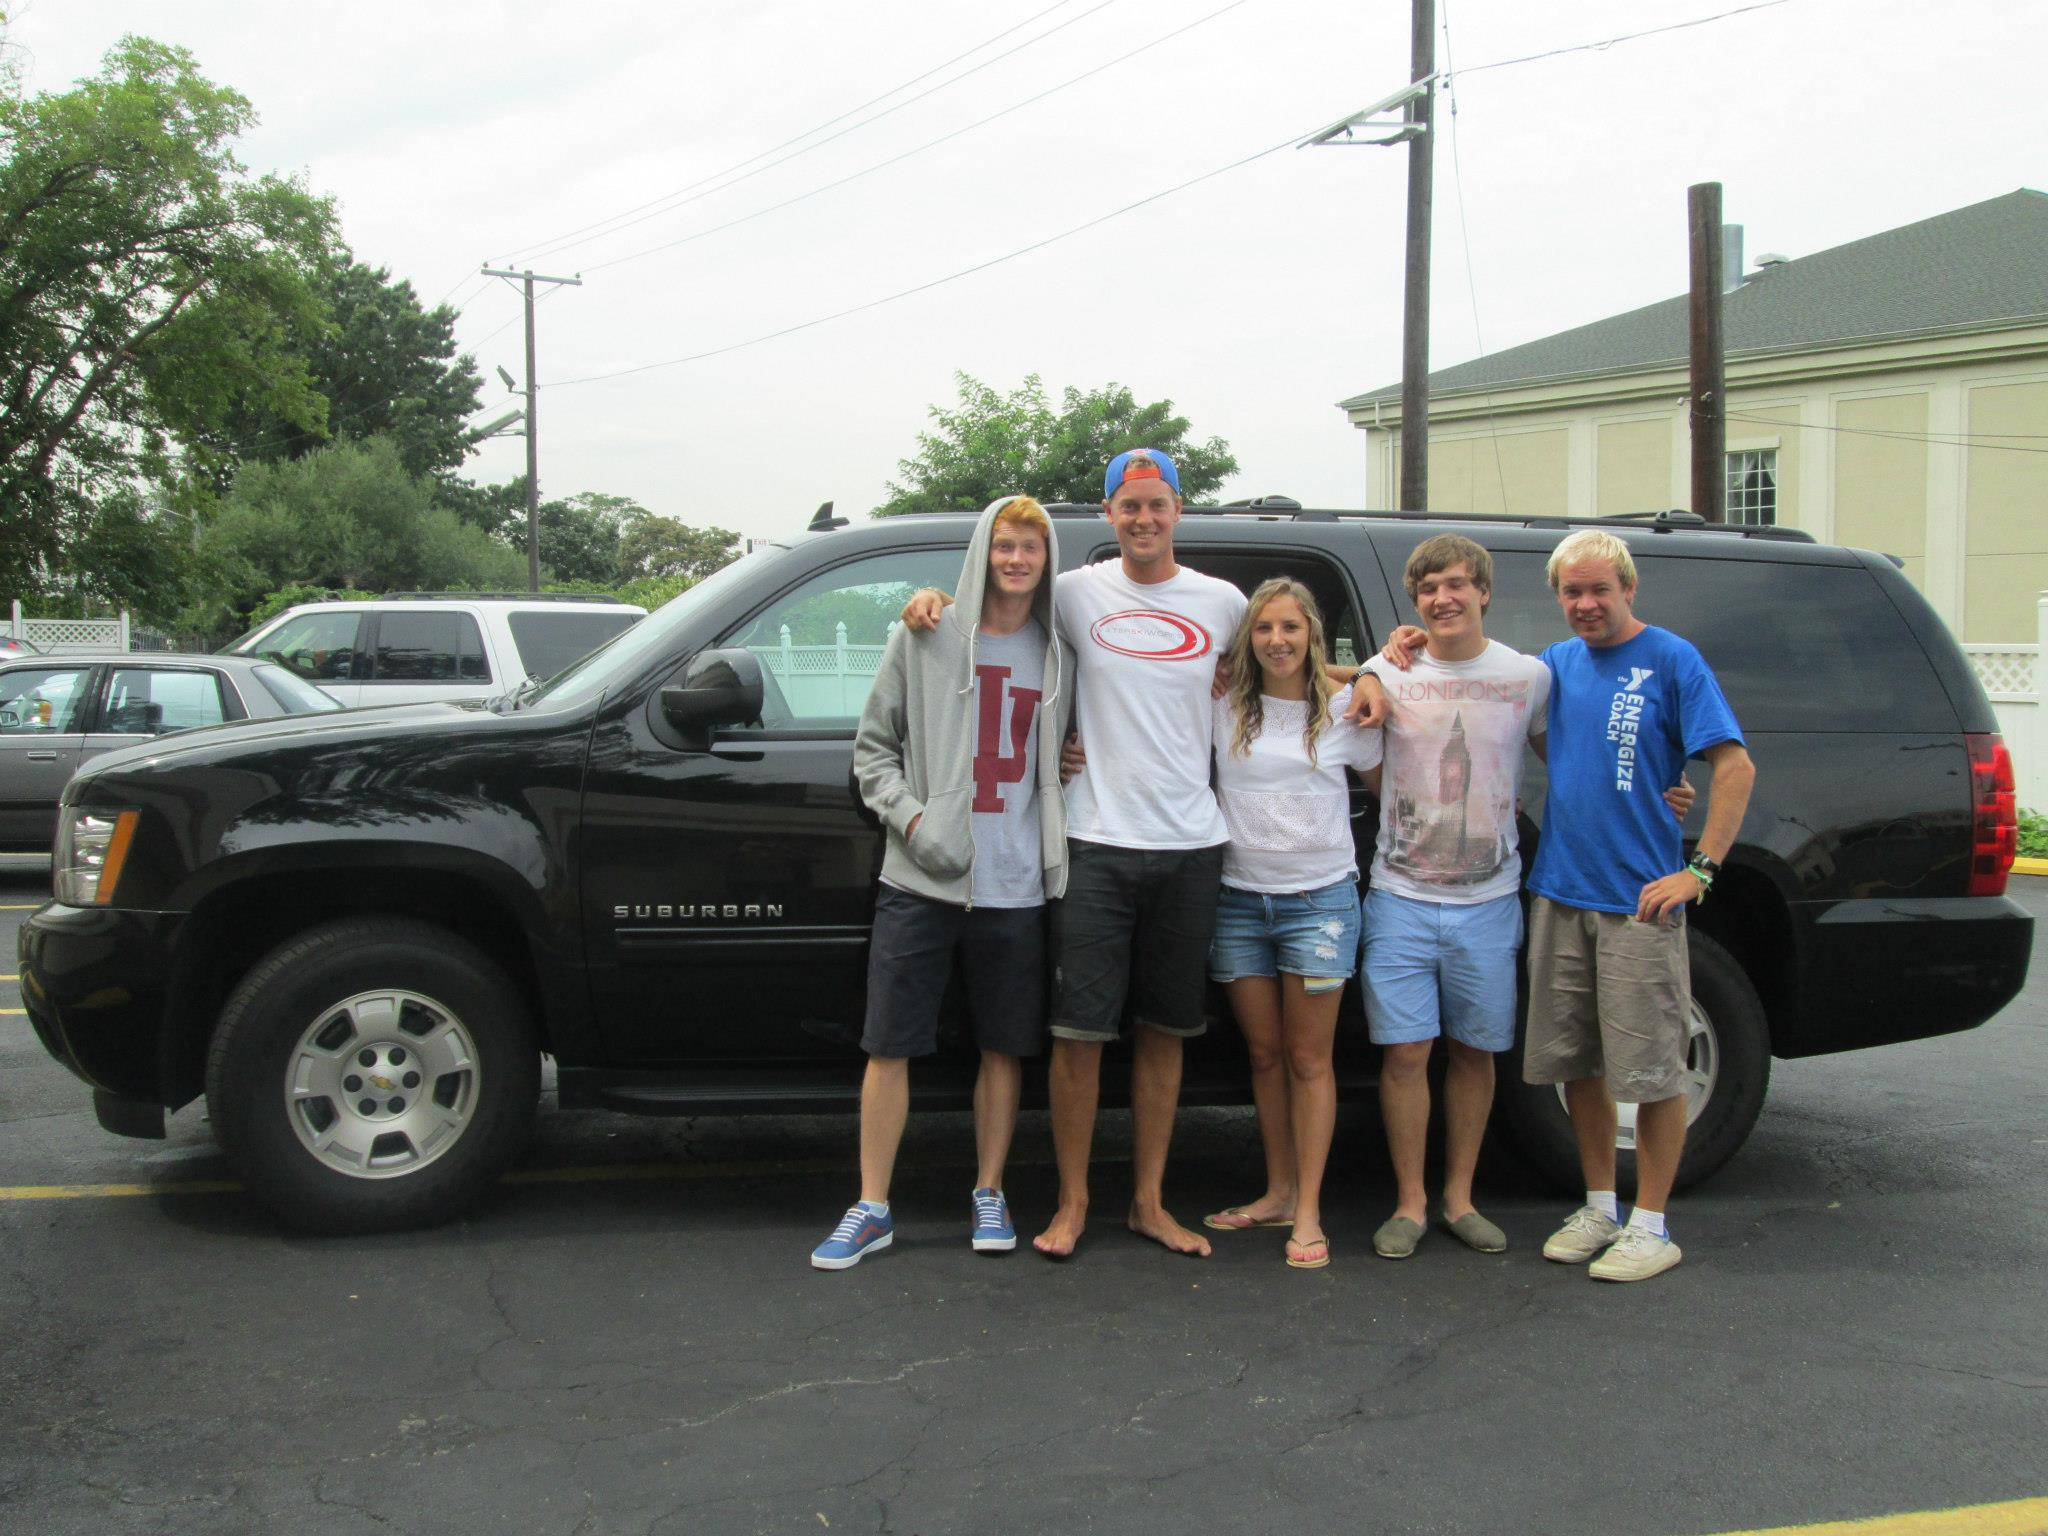 Niagara Falls Crew